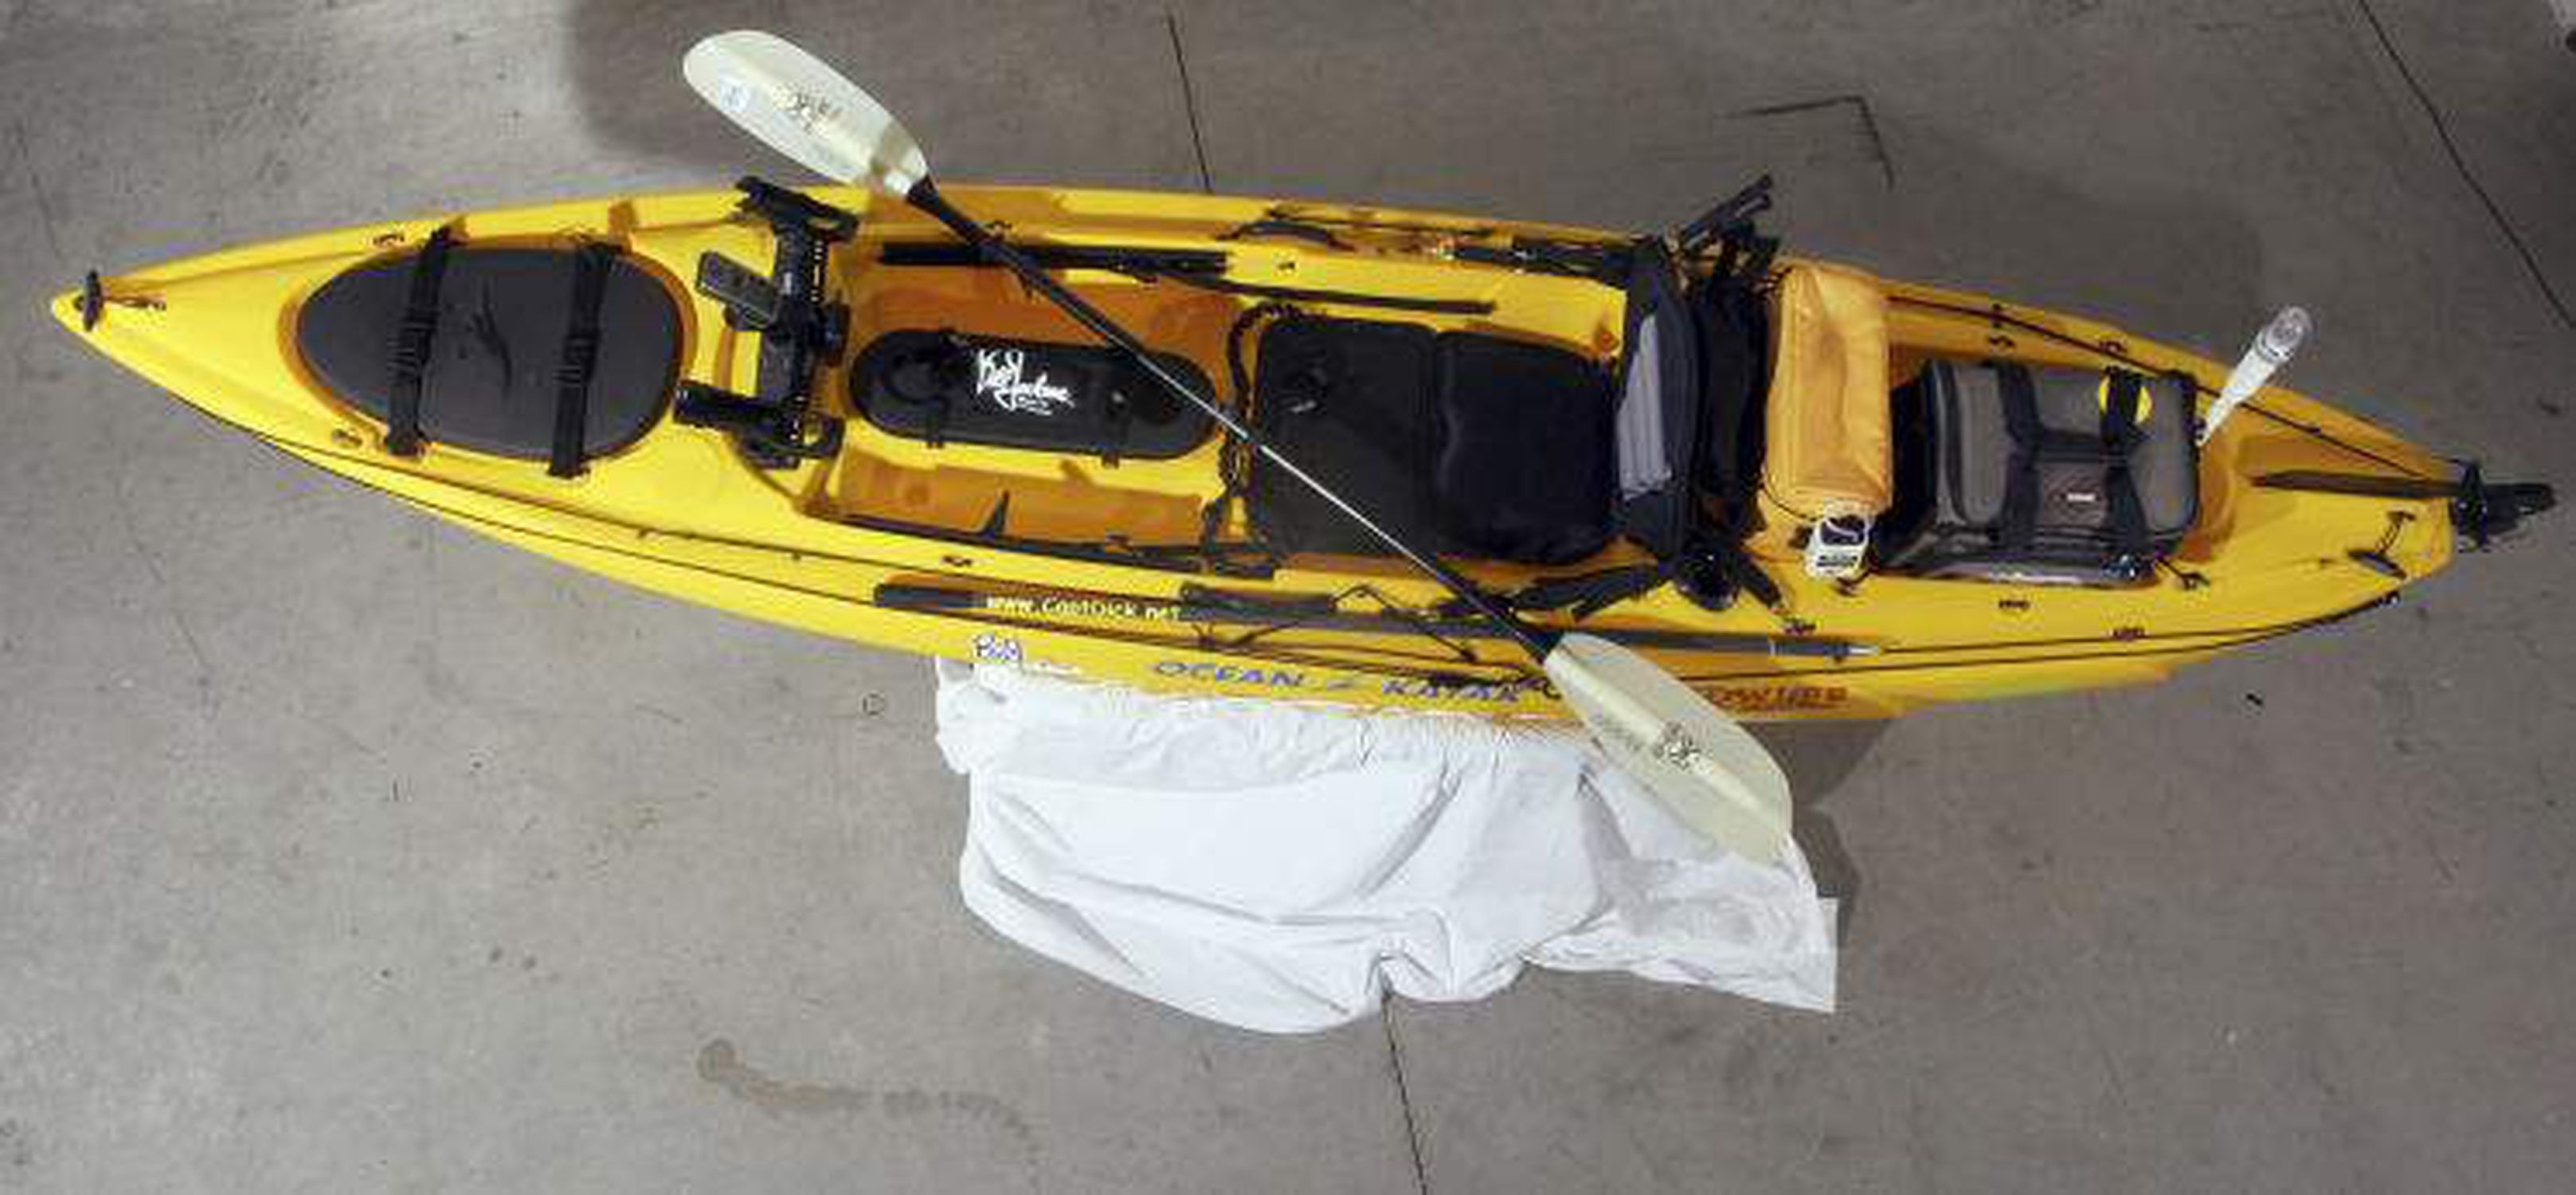 Kayaks For Sale Used Craigslist - Kayak Explorer